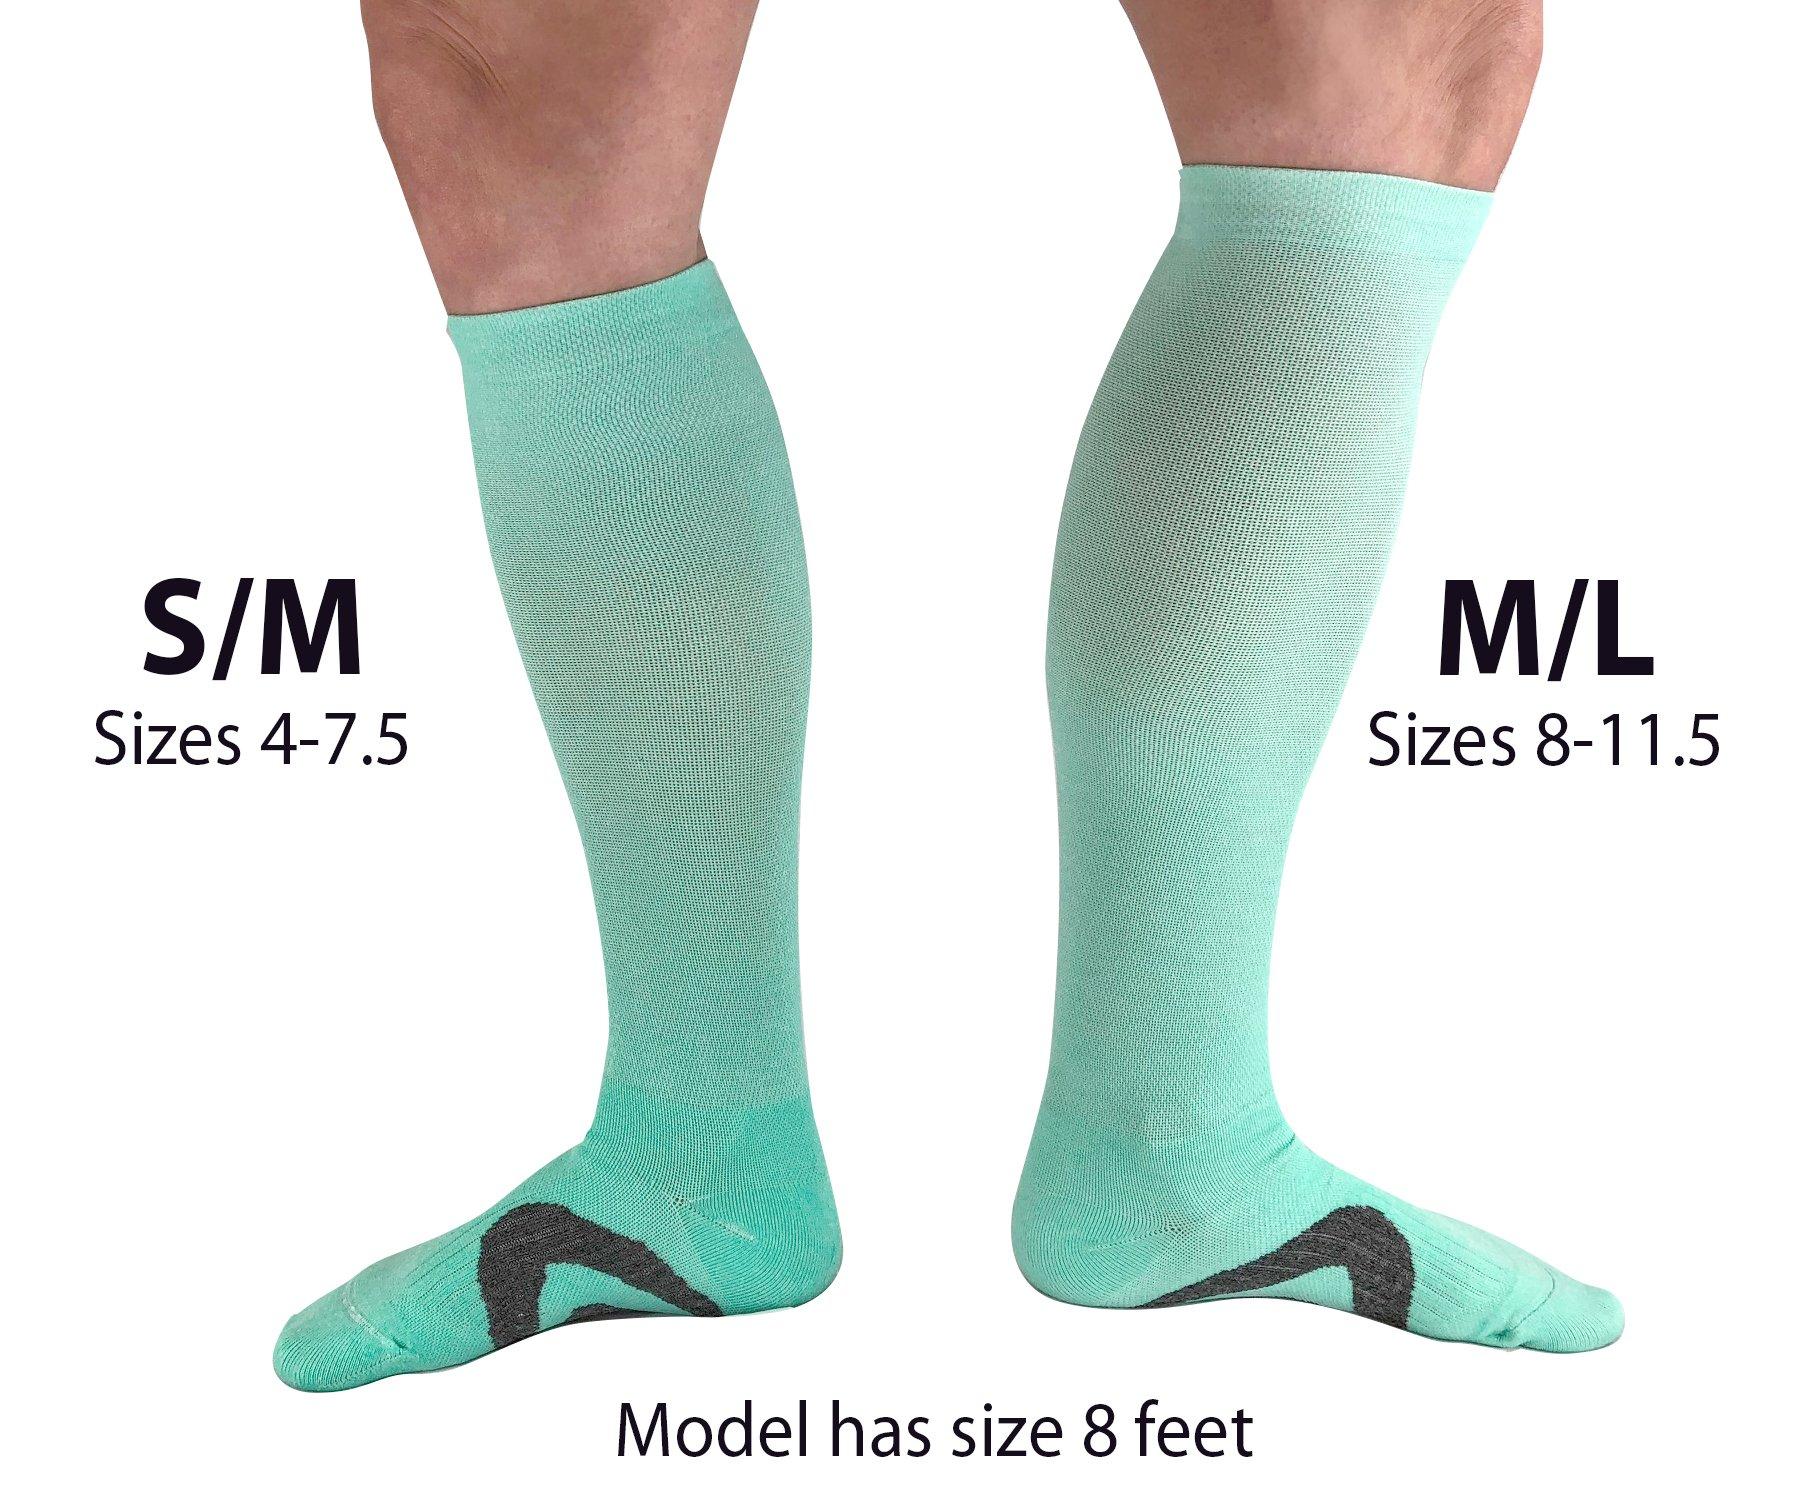 bb83cfa811 Womens Compression Socks | Best for Nurse, Travel, Flights, Maternity,  Pregnancy, Medical and Running | Graduated 15-20 mmHg Knee High Stockings  ...